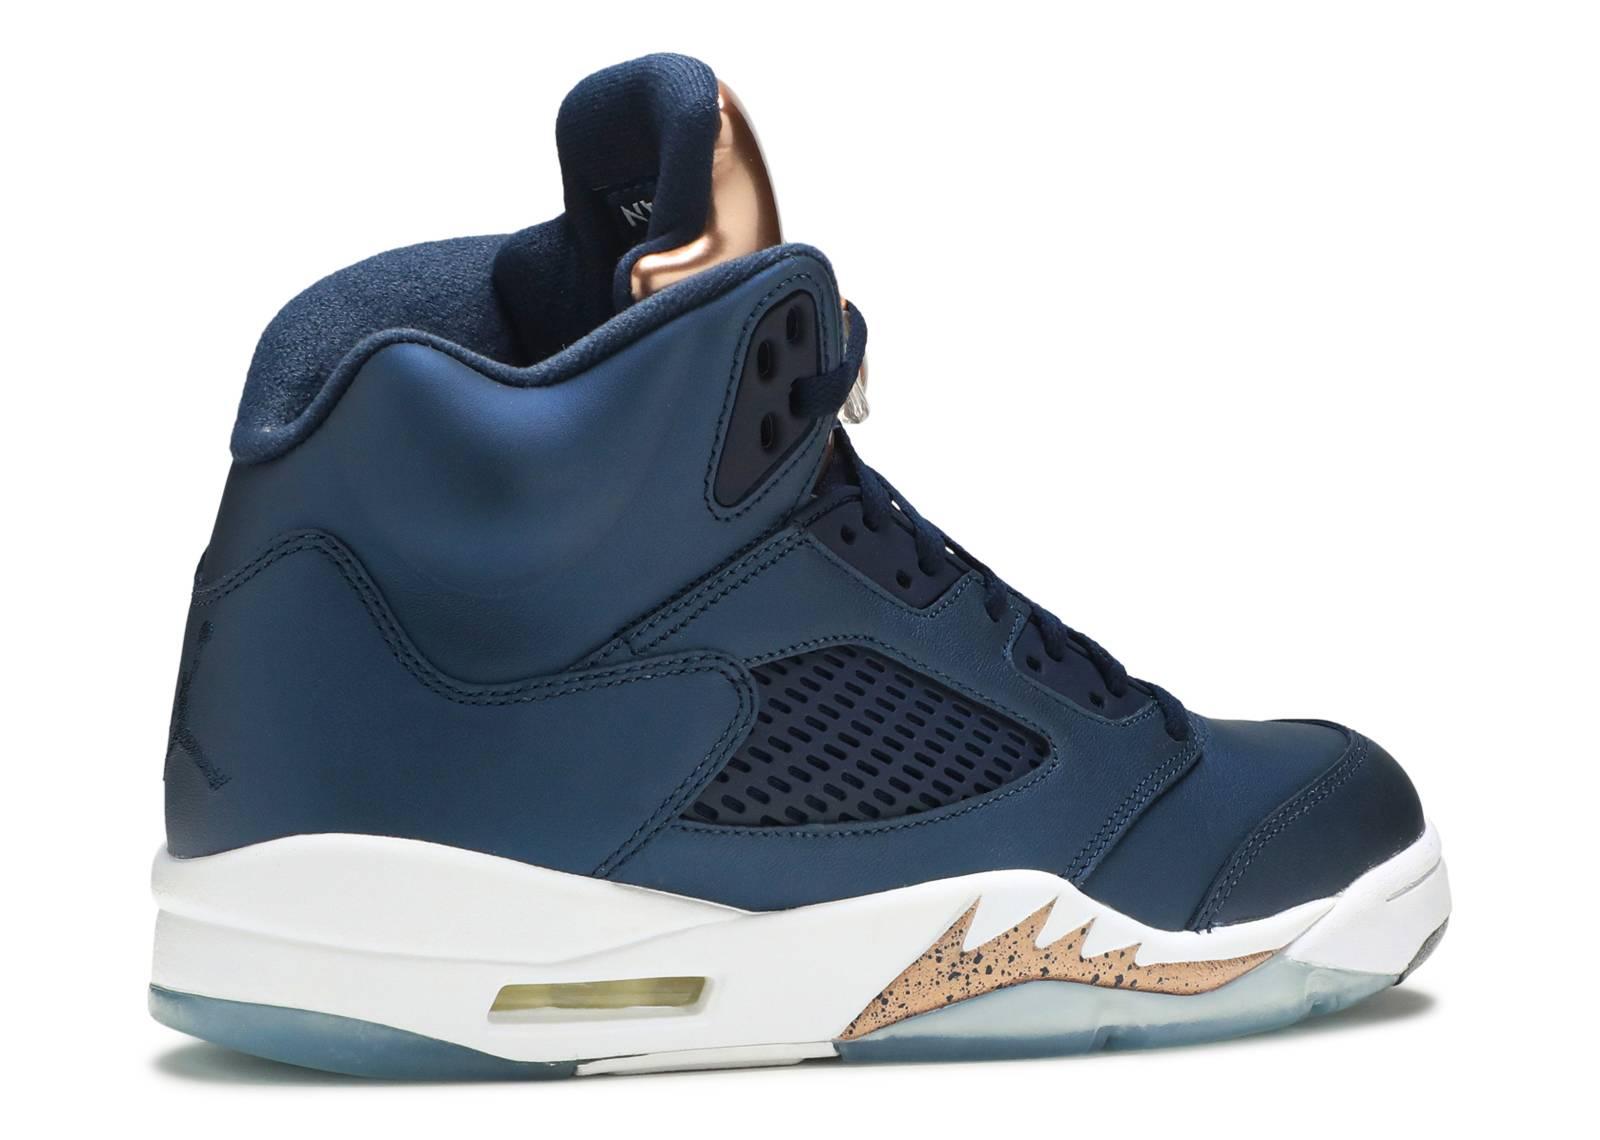 Jordan 5 Bronze